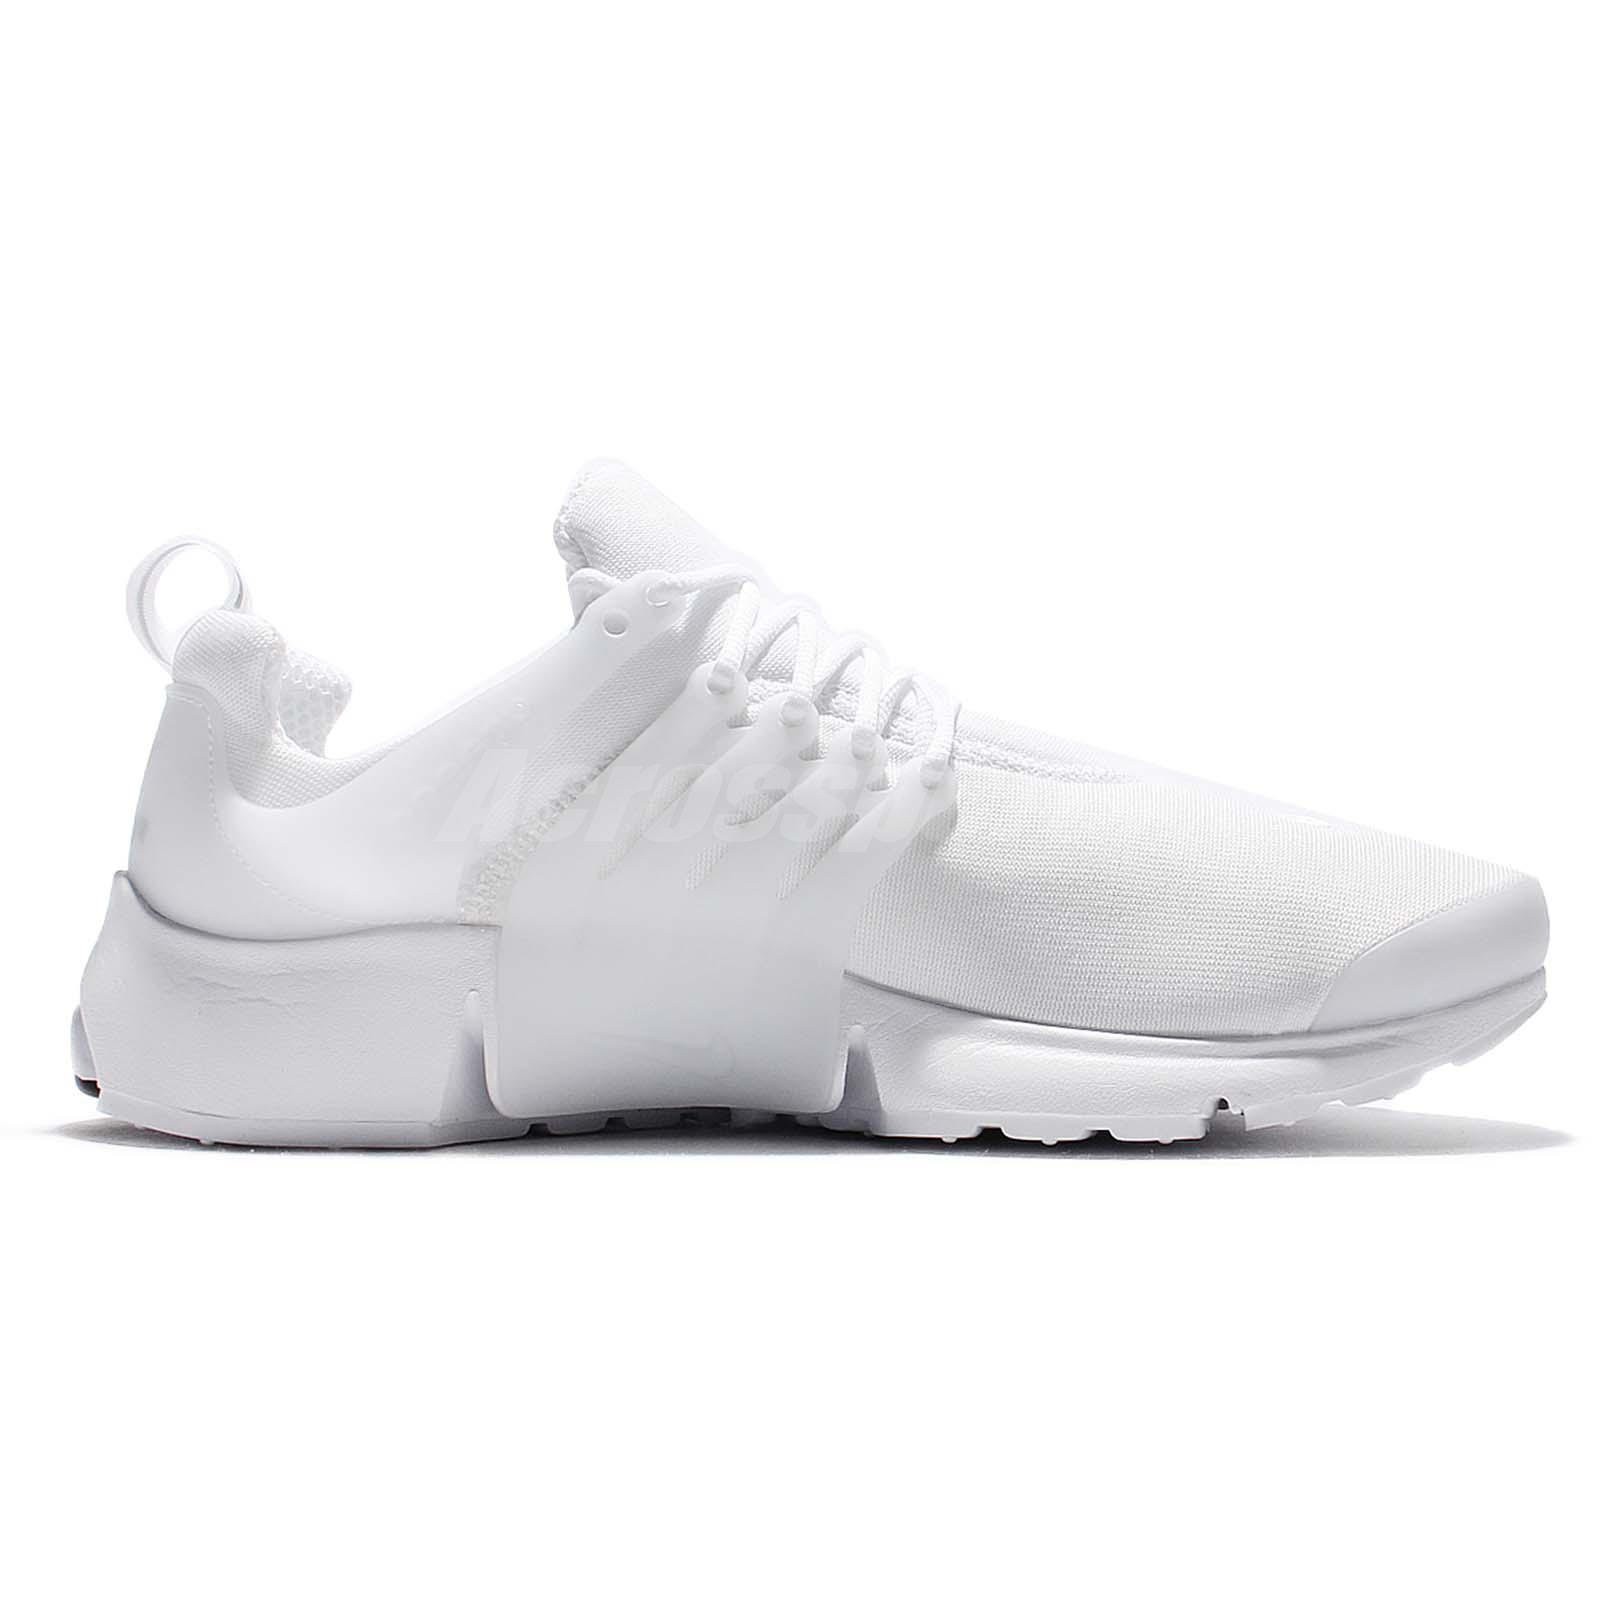 Buy nike air presto white mens - 65% OFF 4dc5a9036f